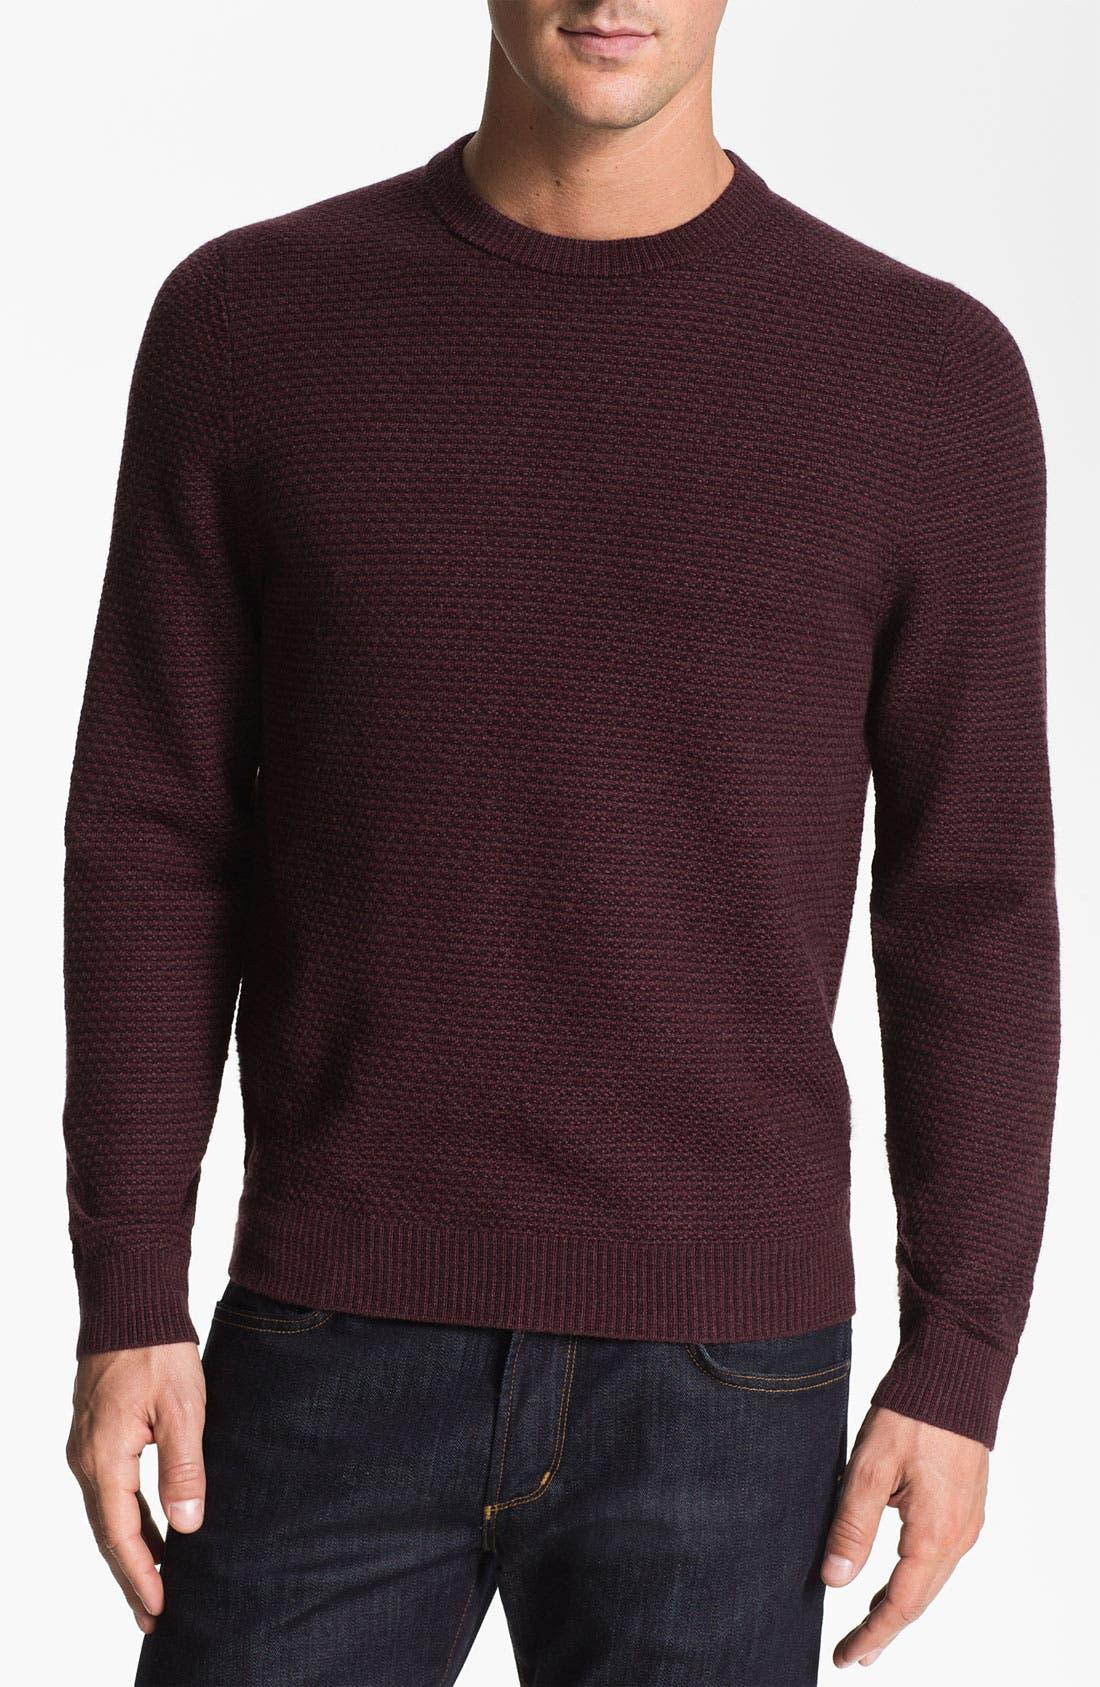 Alternate Image 1 Selected - Nordstrom Merino Wool Crewneck Sweater